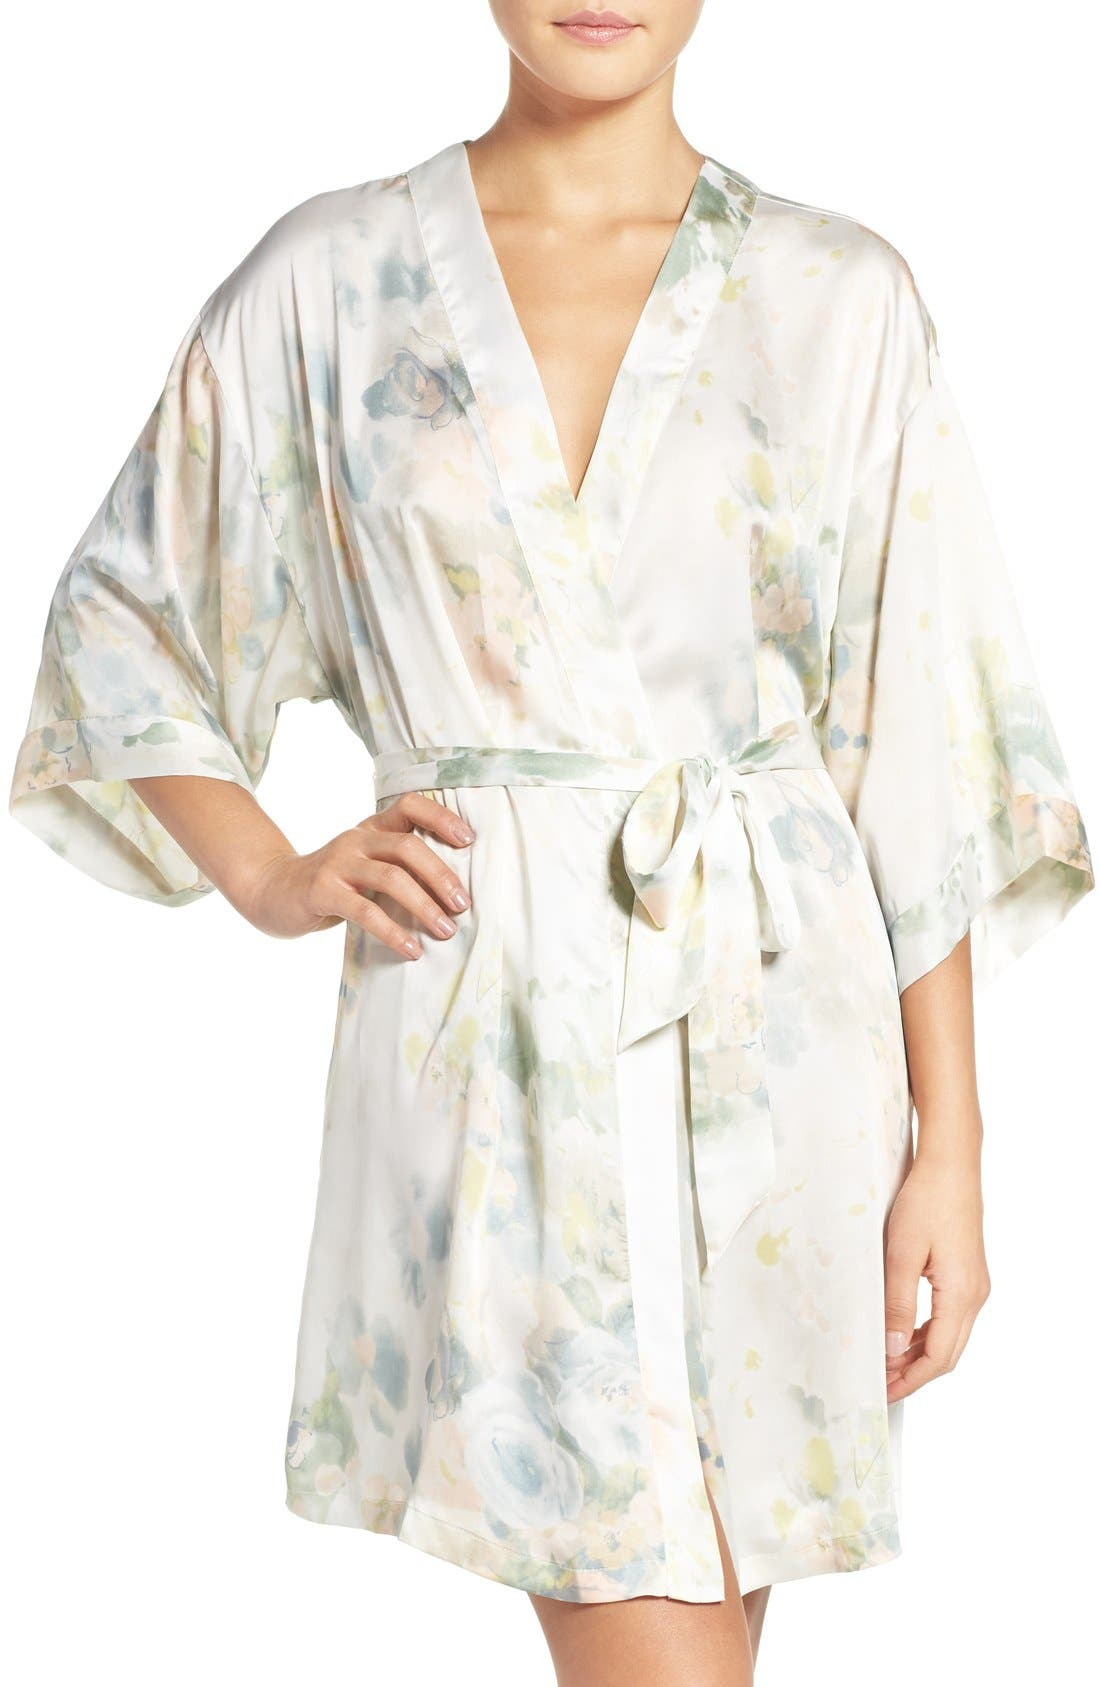 Isabella Floral Print Kimono Robe,                         Main,                         color, 110